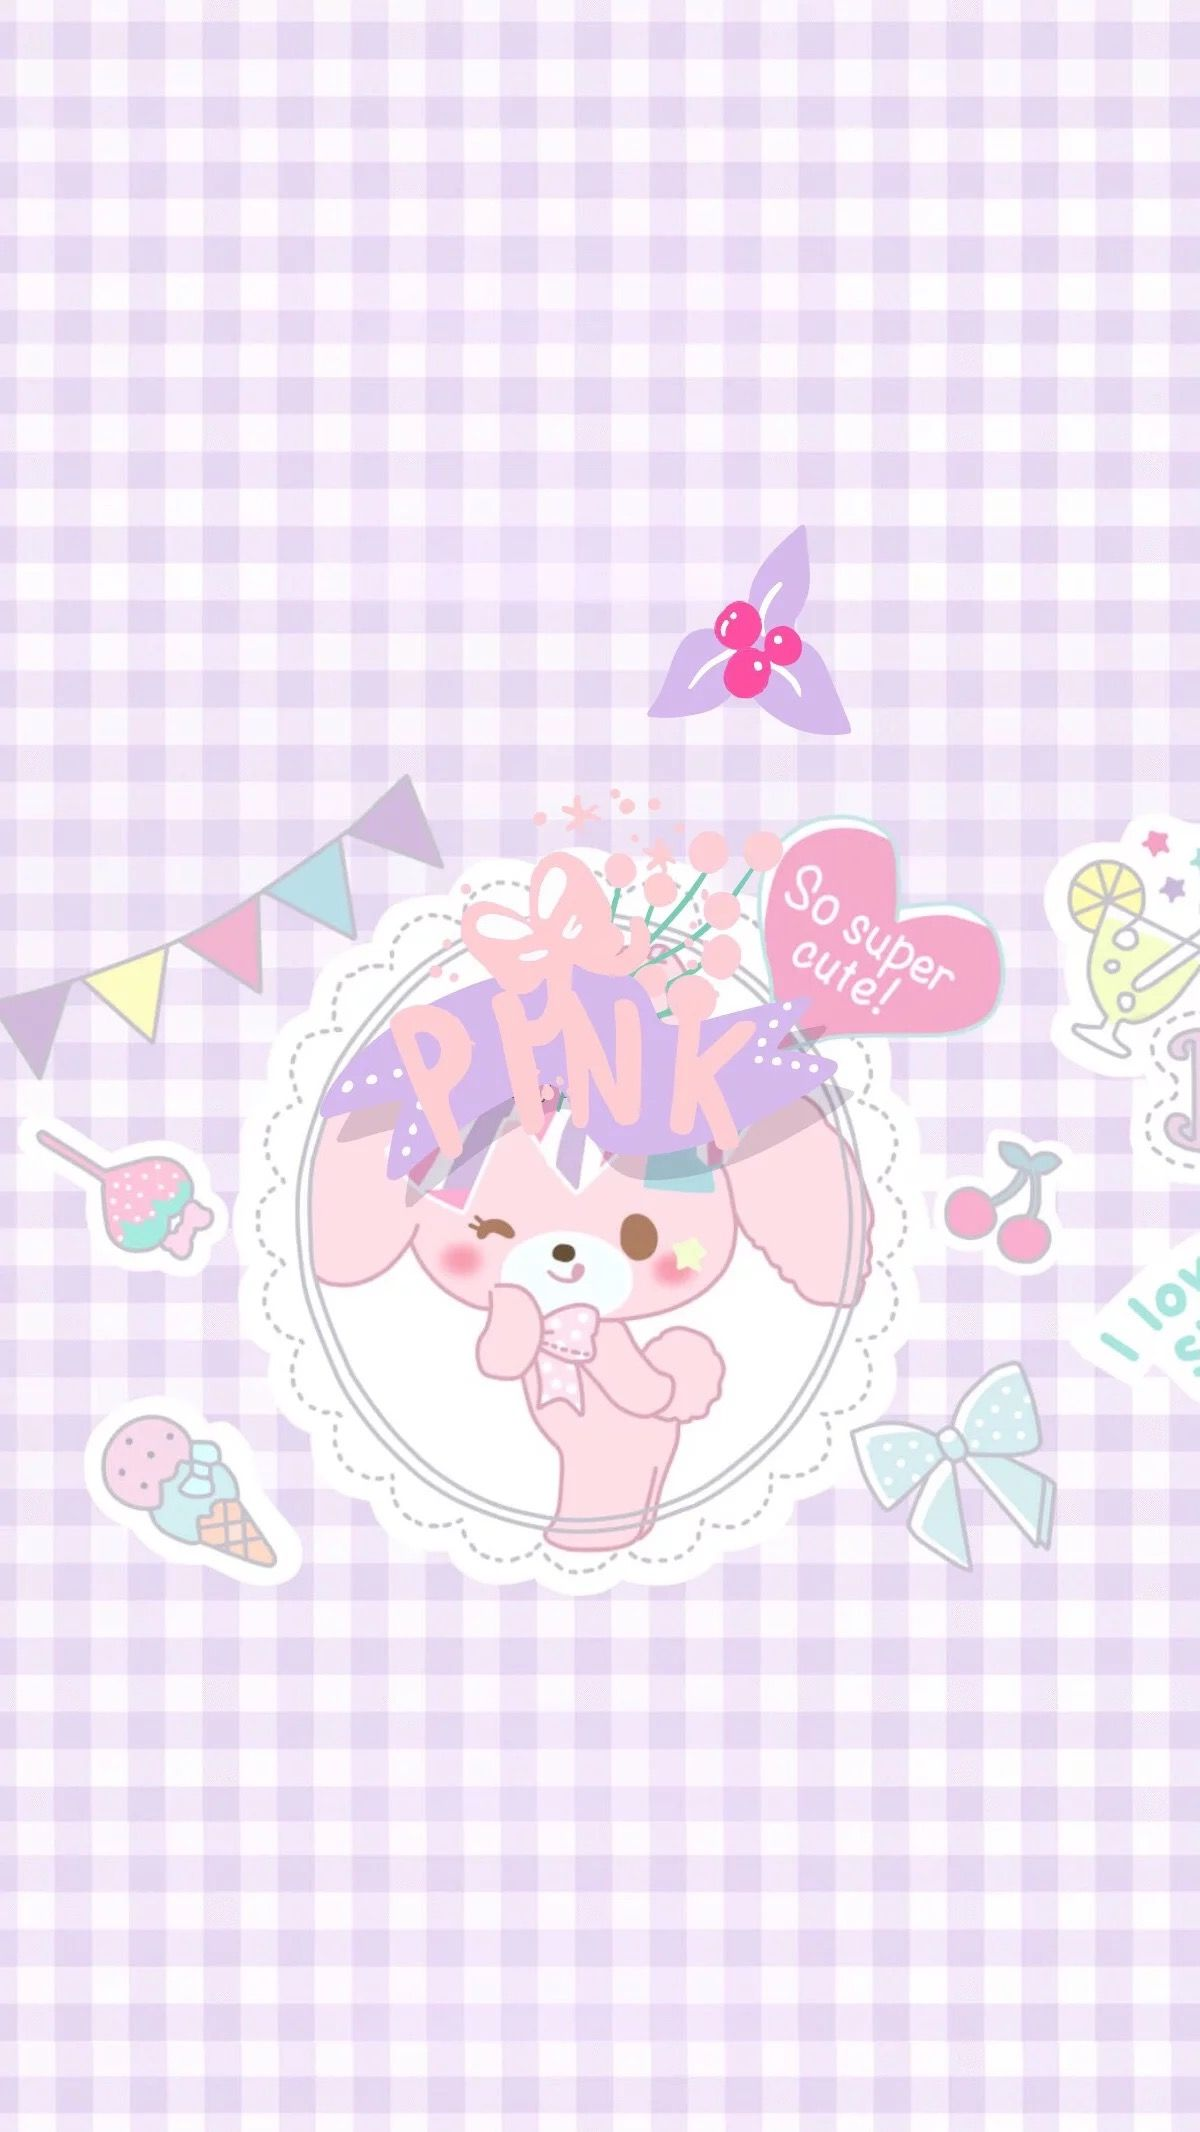 Great Wallpaper Hello Kitty Iphone 6 - 1e9686f1e054580f1a9ae1465793a912  Trends_852915.jpg